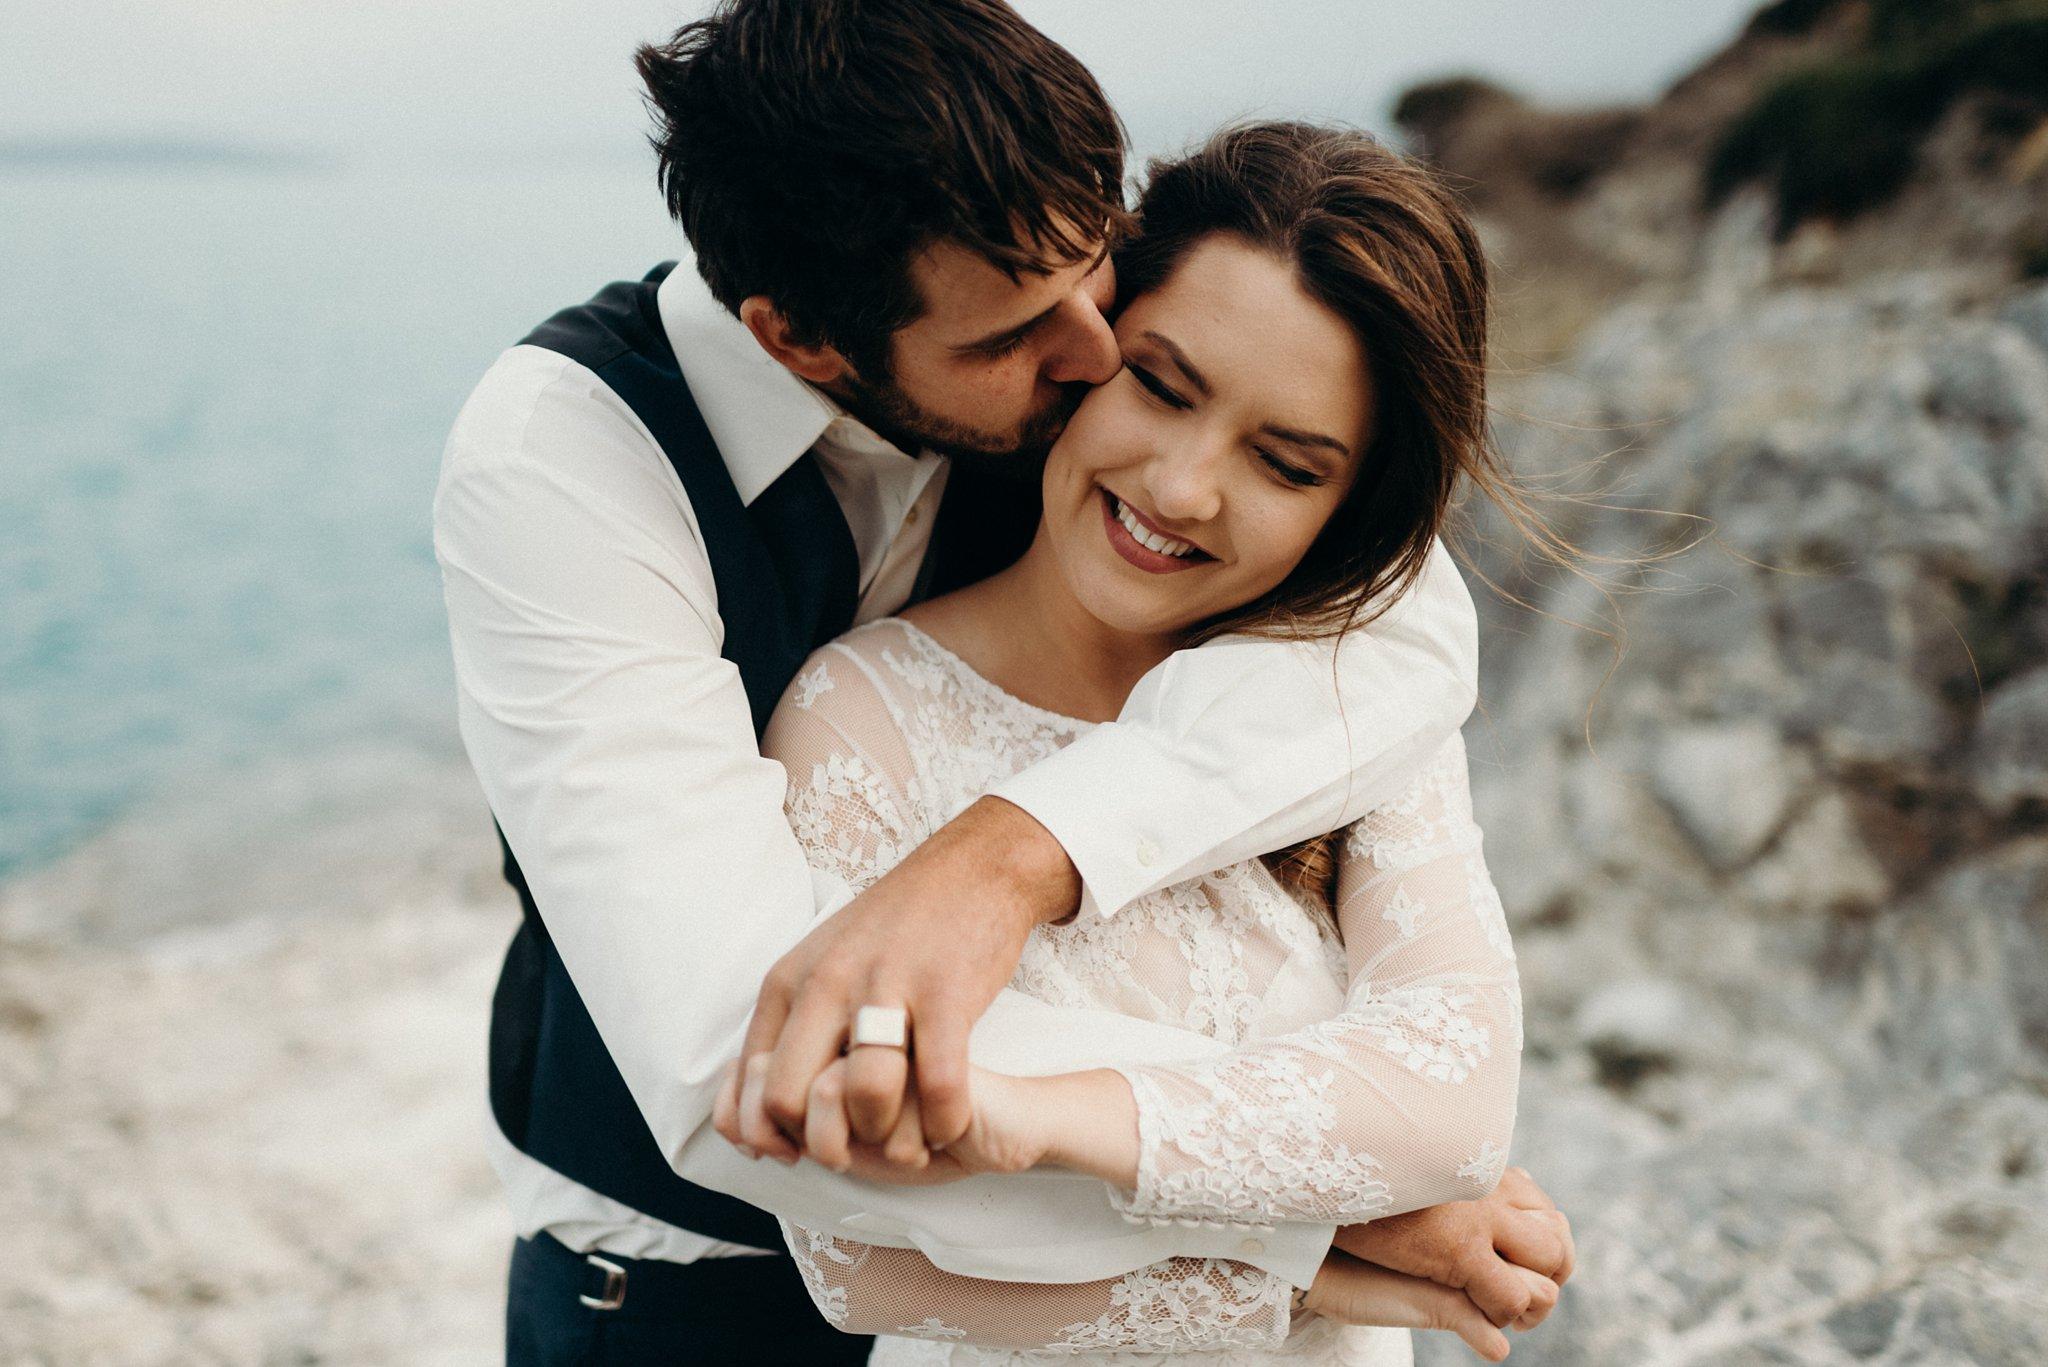 kaihla_tonai_intimate_wedding_elopement_photographer_6752.jpg